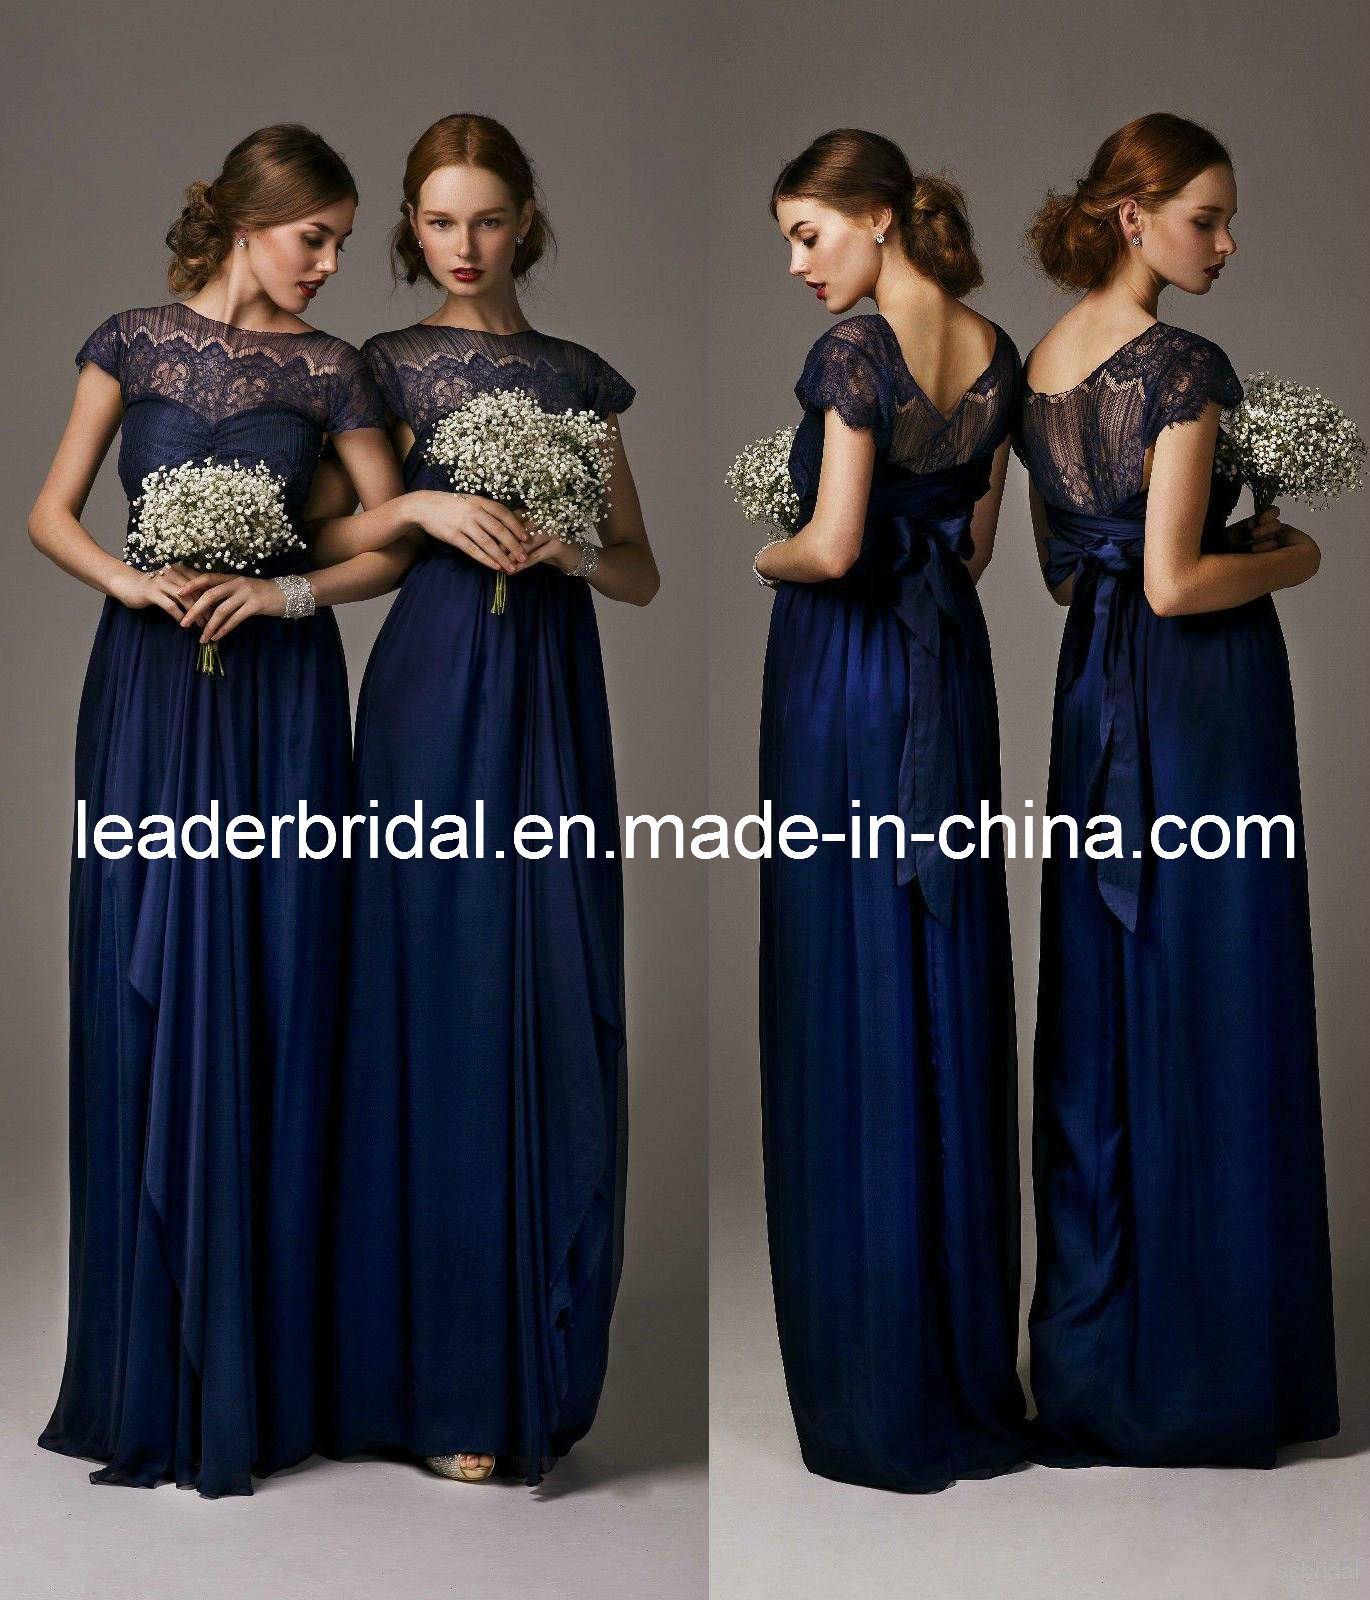 China New Bridesmaid Dresses Navy Blue Lace Chiffon Empire